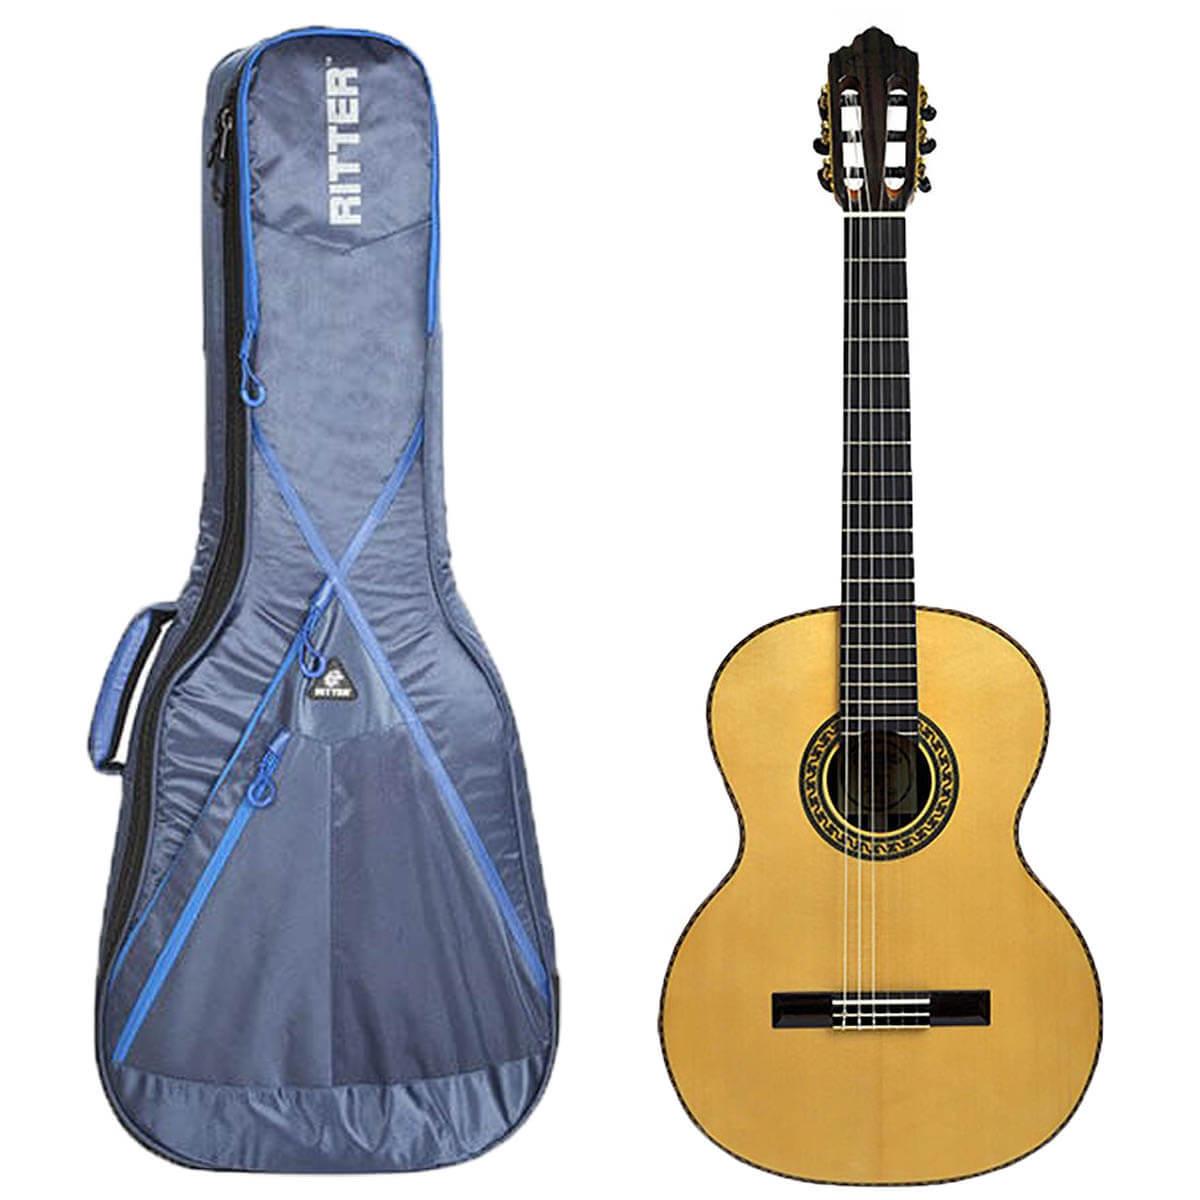 Santana ST600 spansk guitar med taske